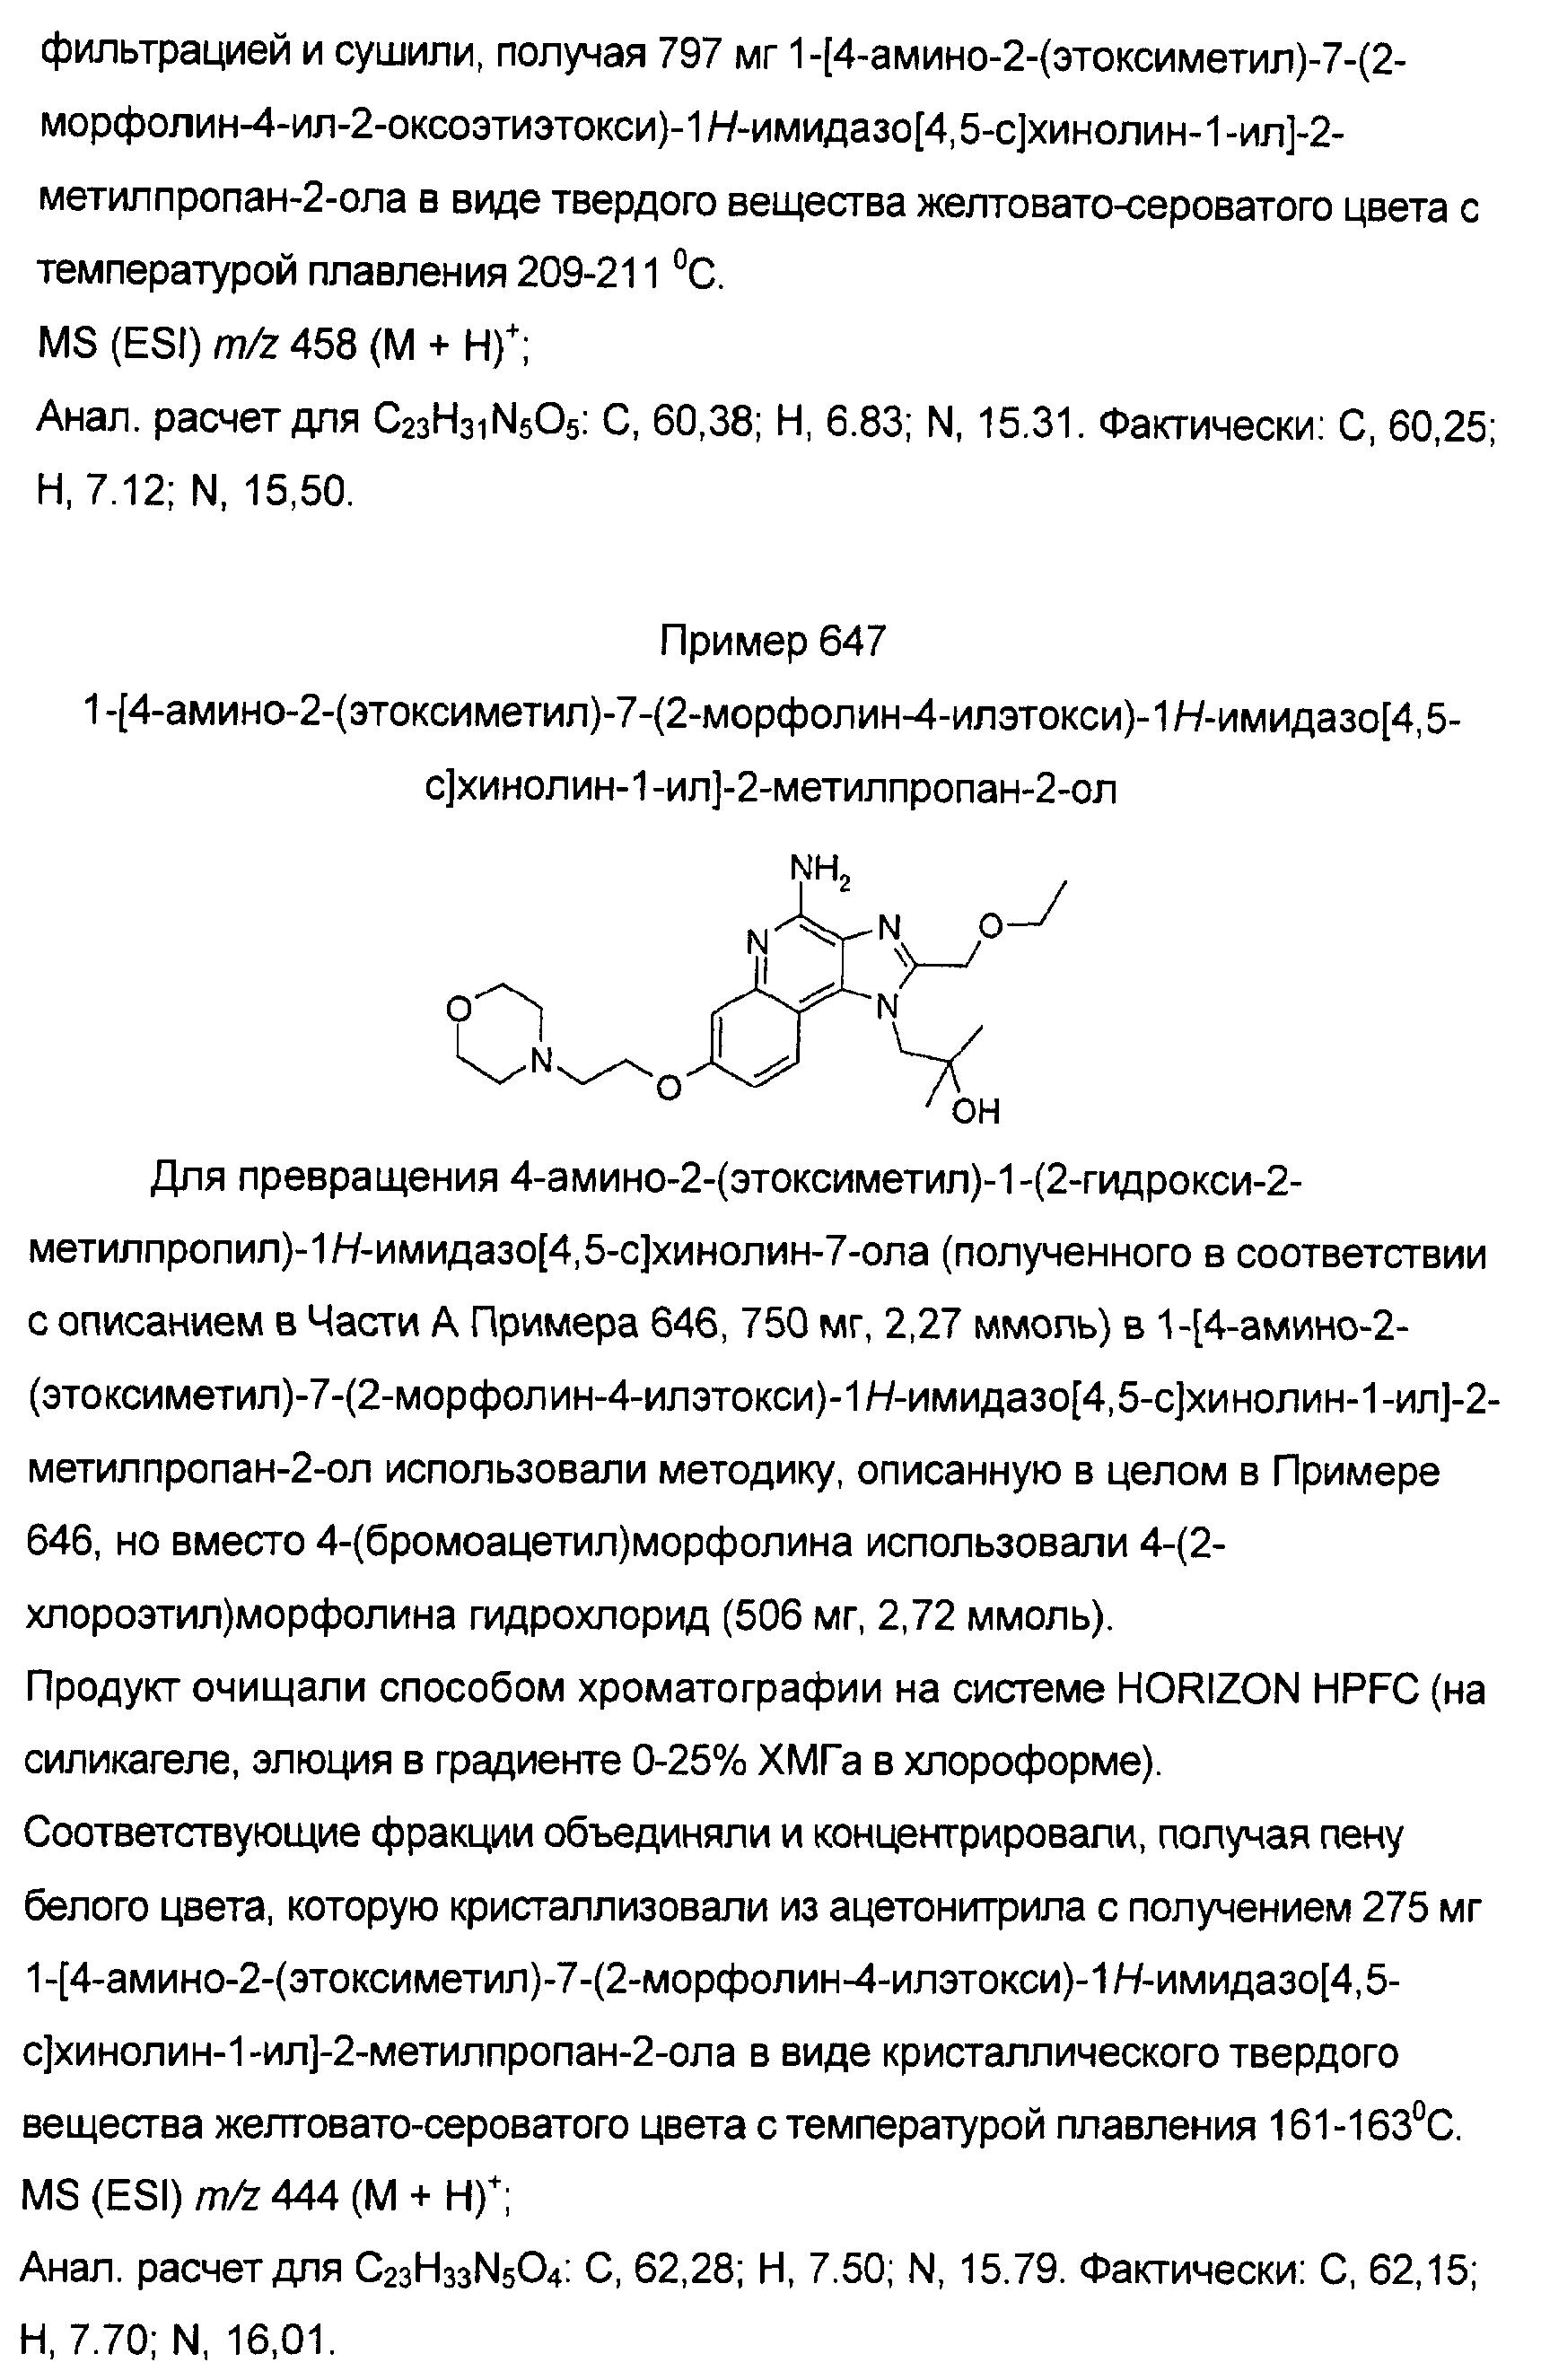 Figure 00000355